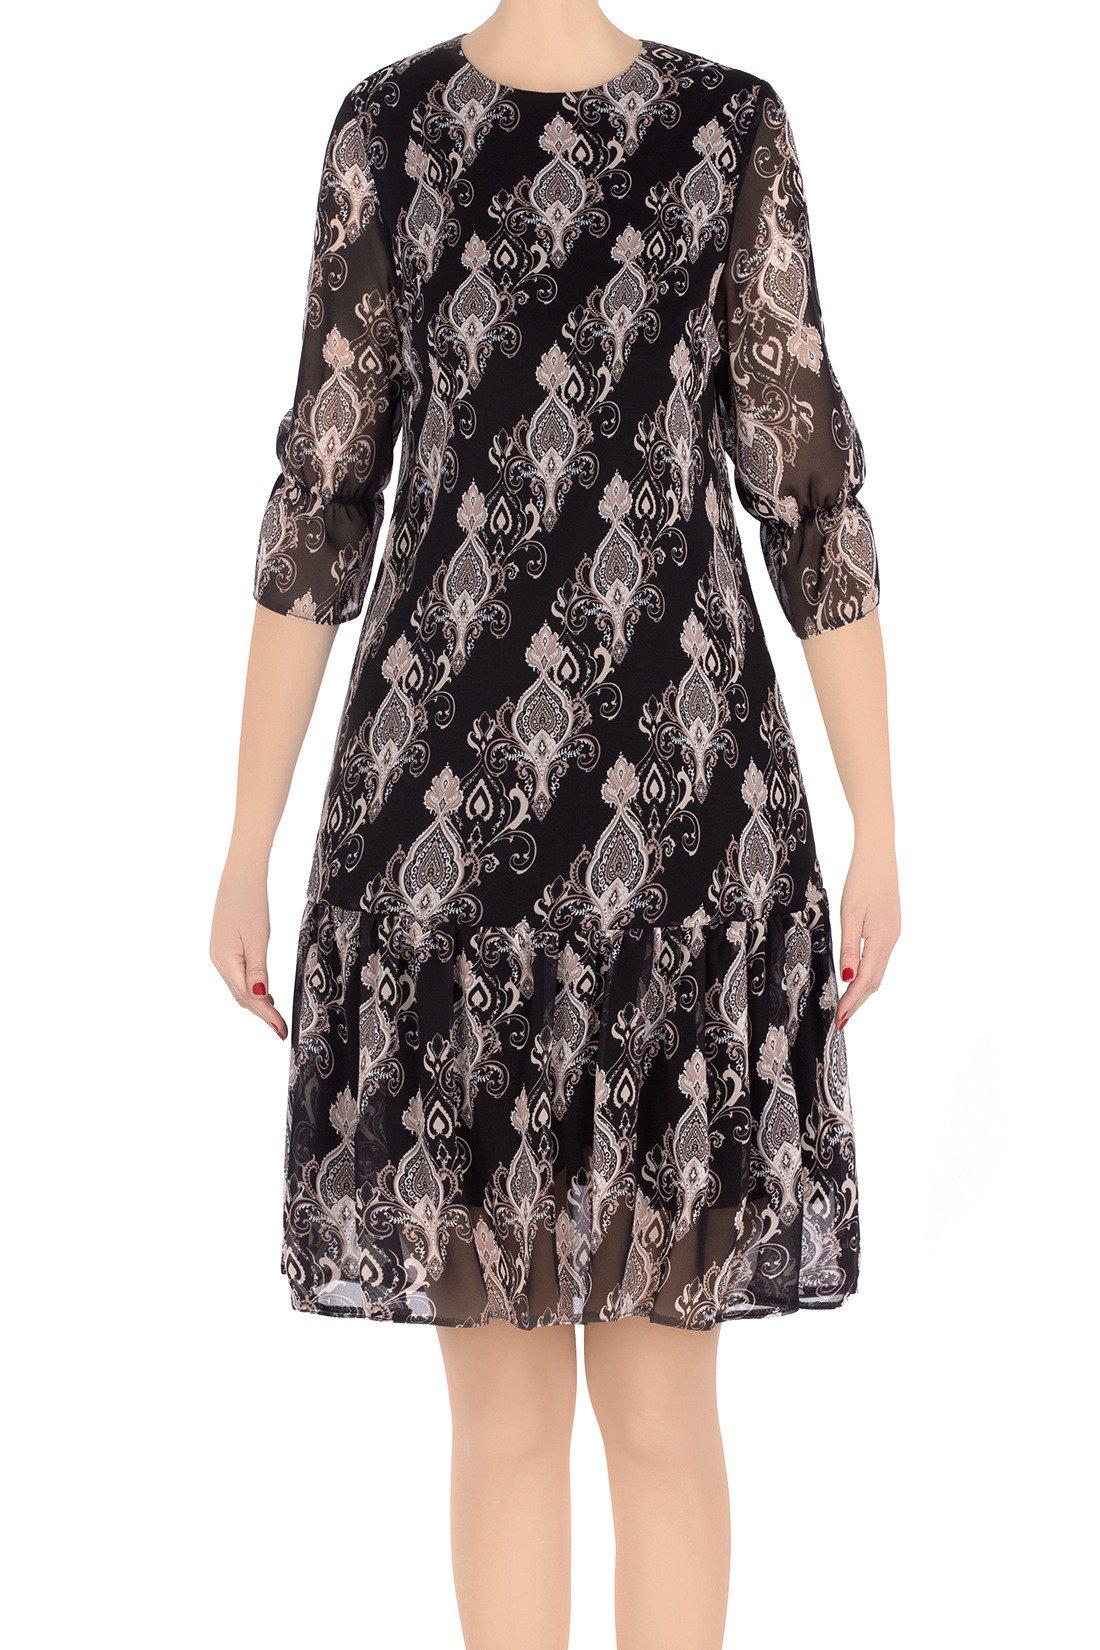 01cbed32de Luźna sukienka damska Marisa czarna w azteckie wzory 3206